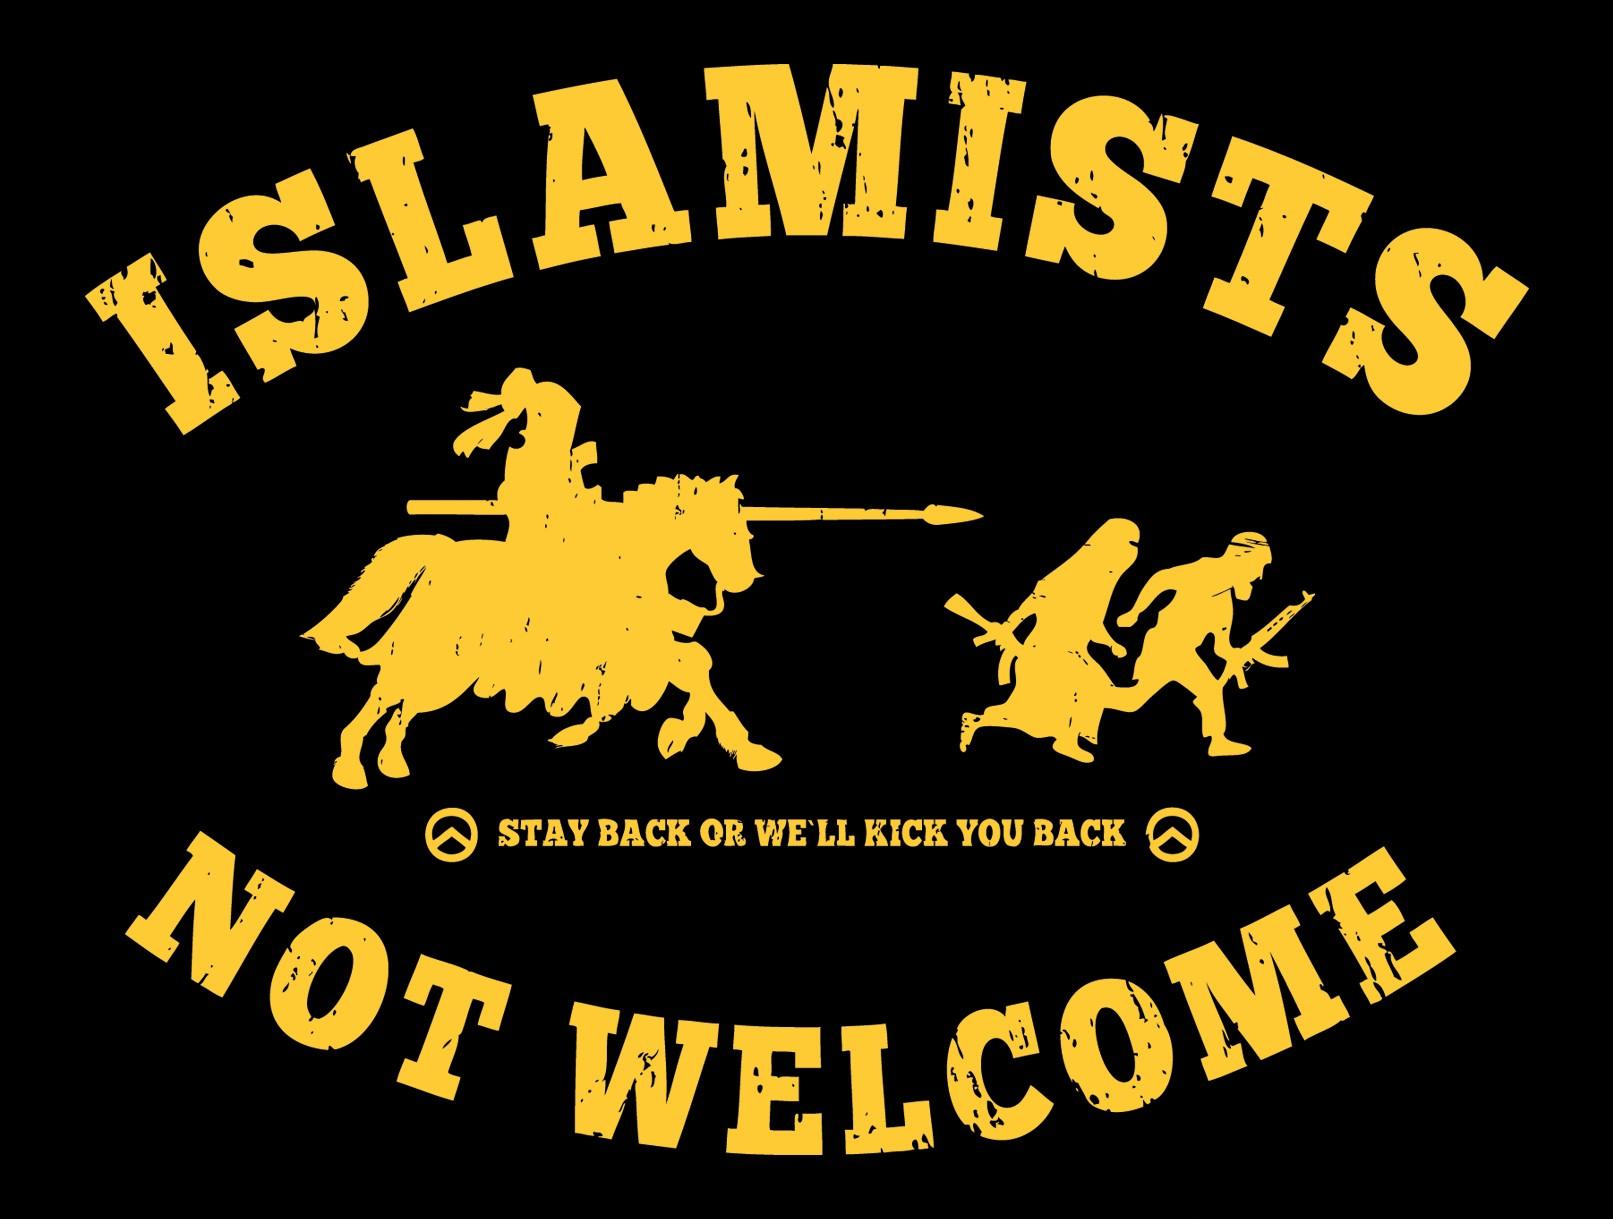 aufkleberislamists-not-welcome